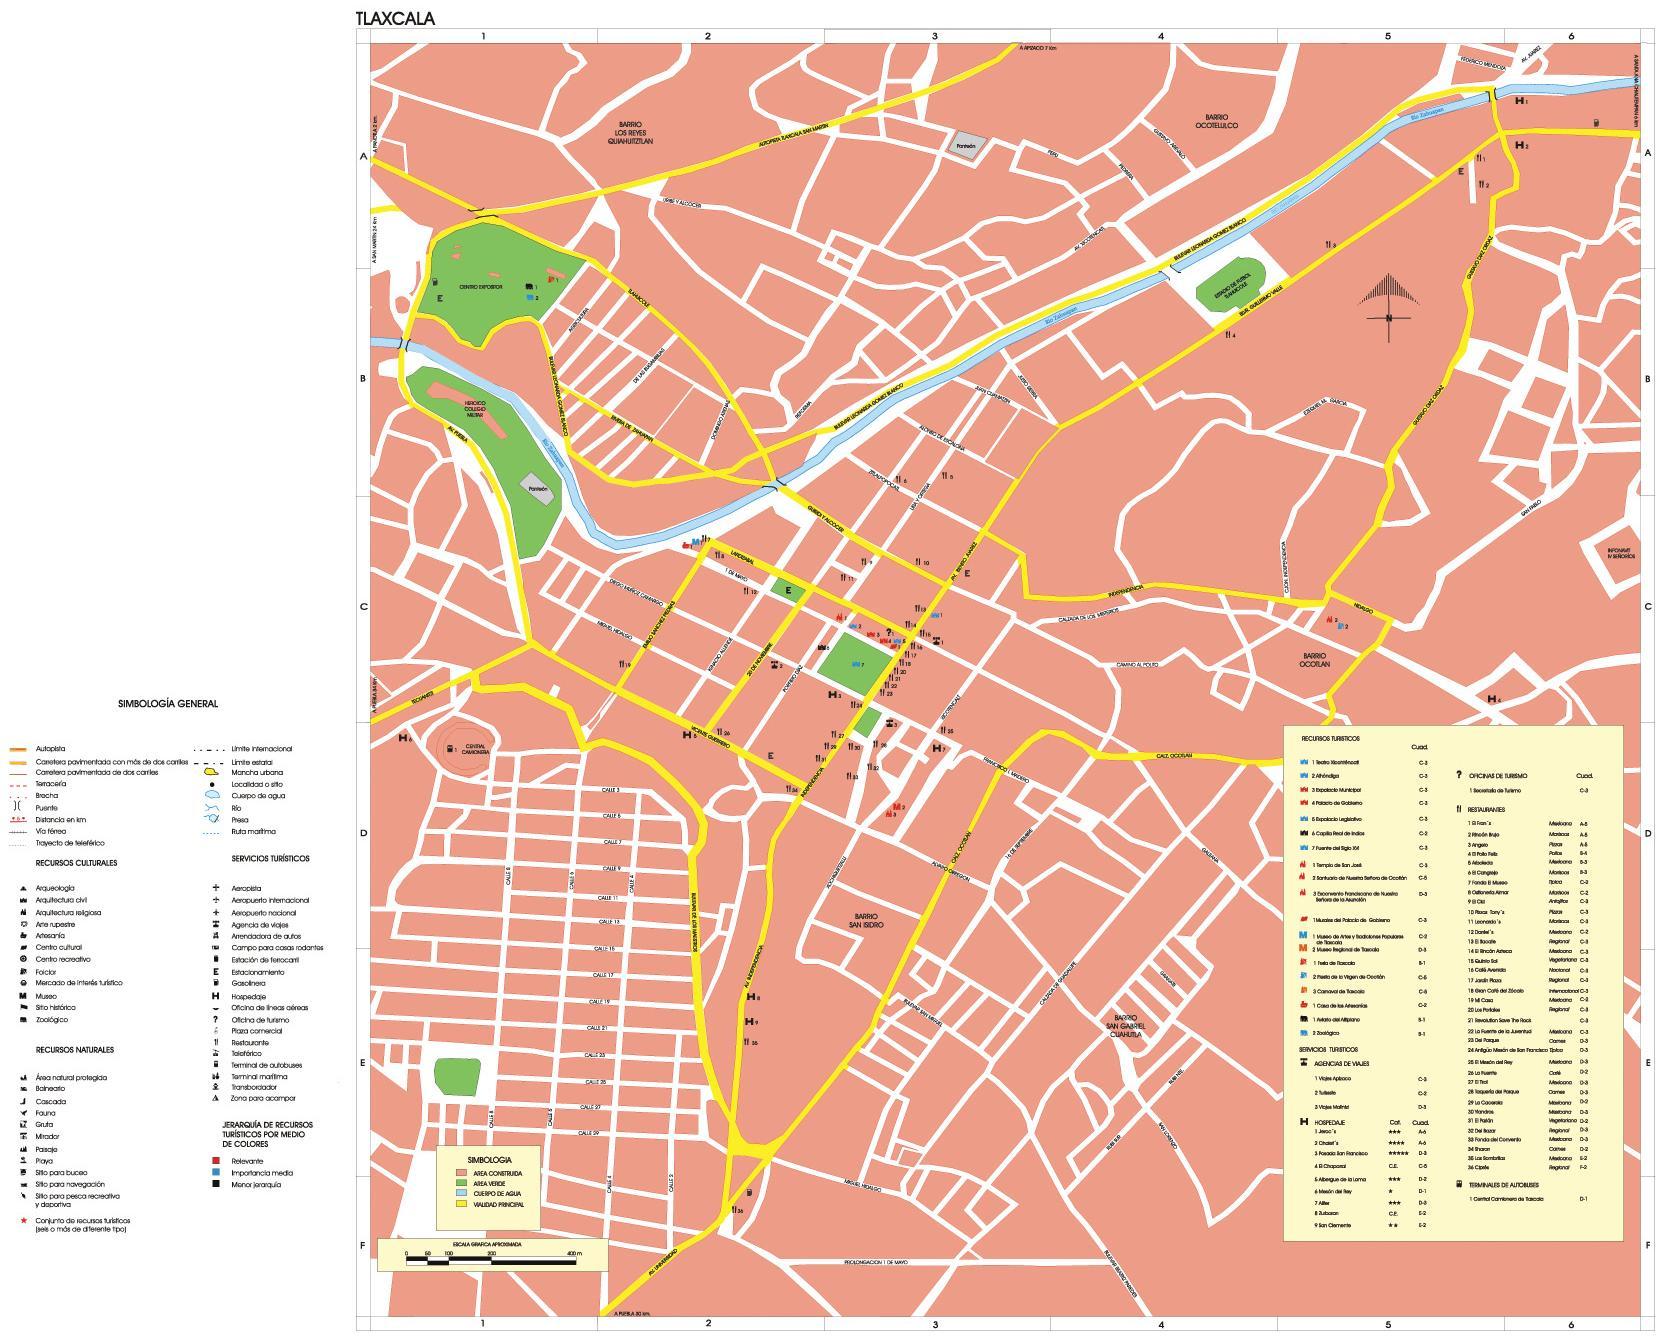 Tlaxcala Map, Tlaxcala, Mexico